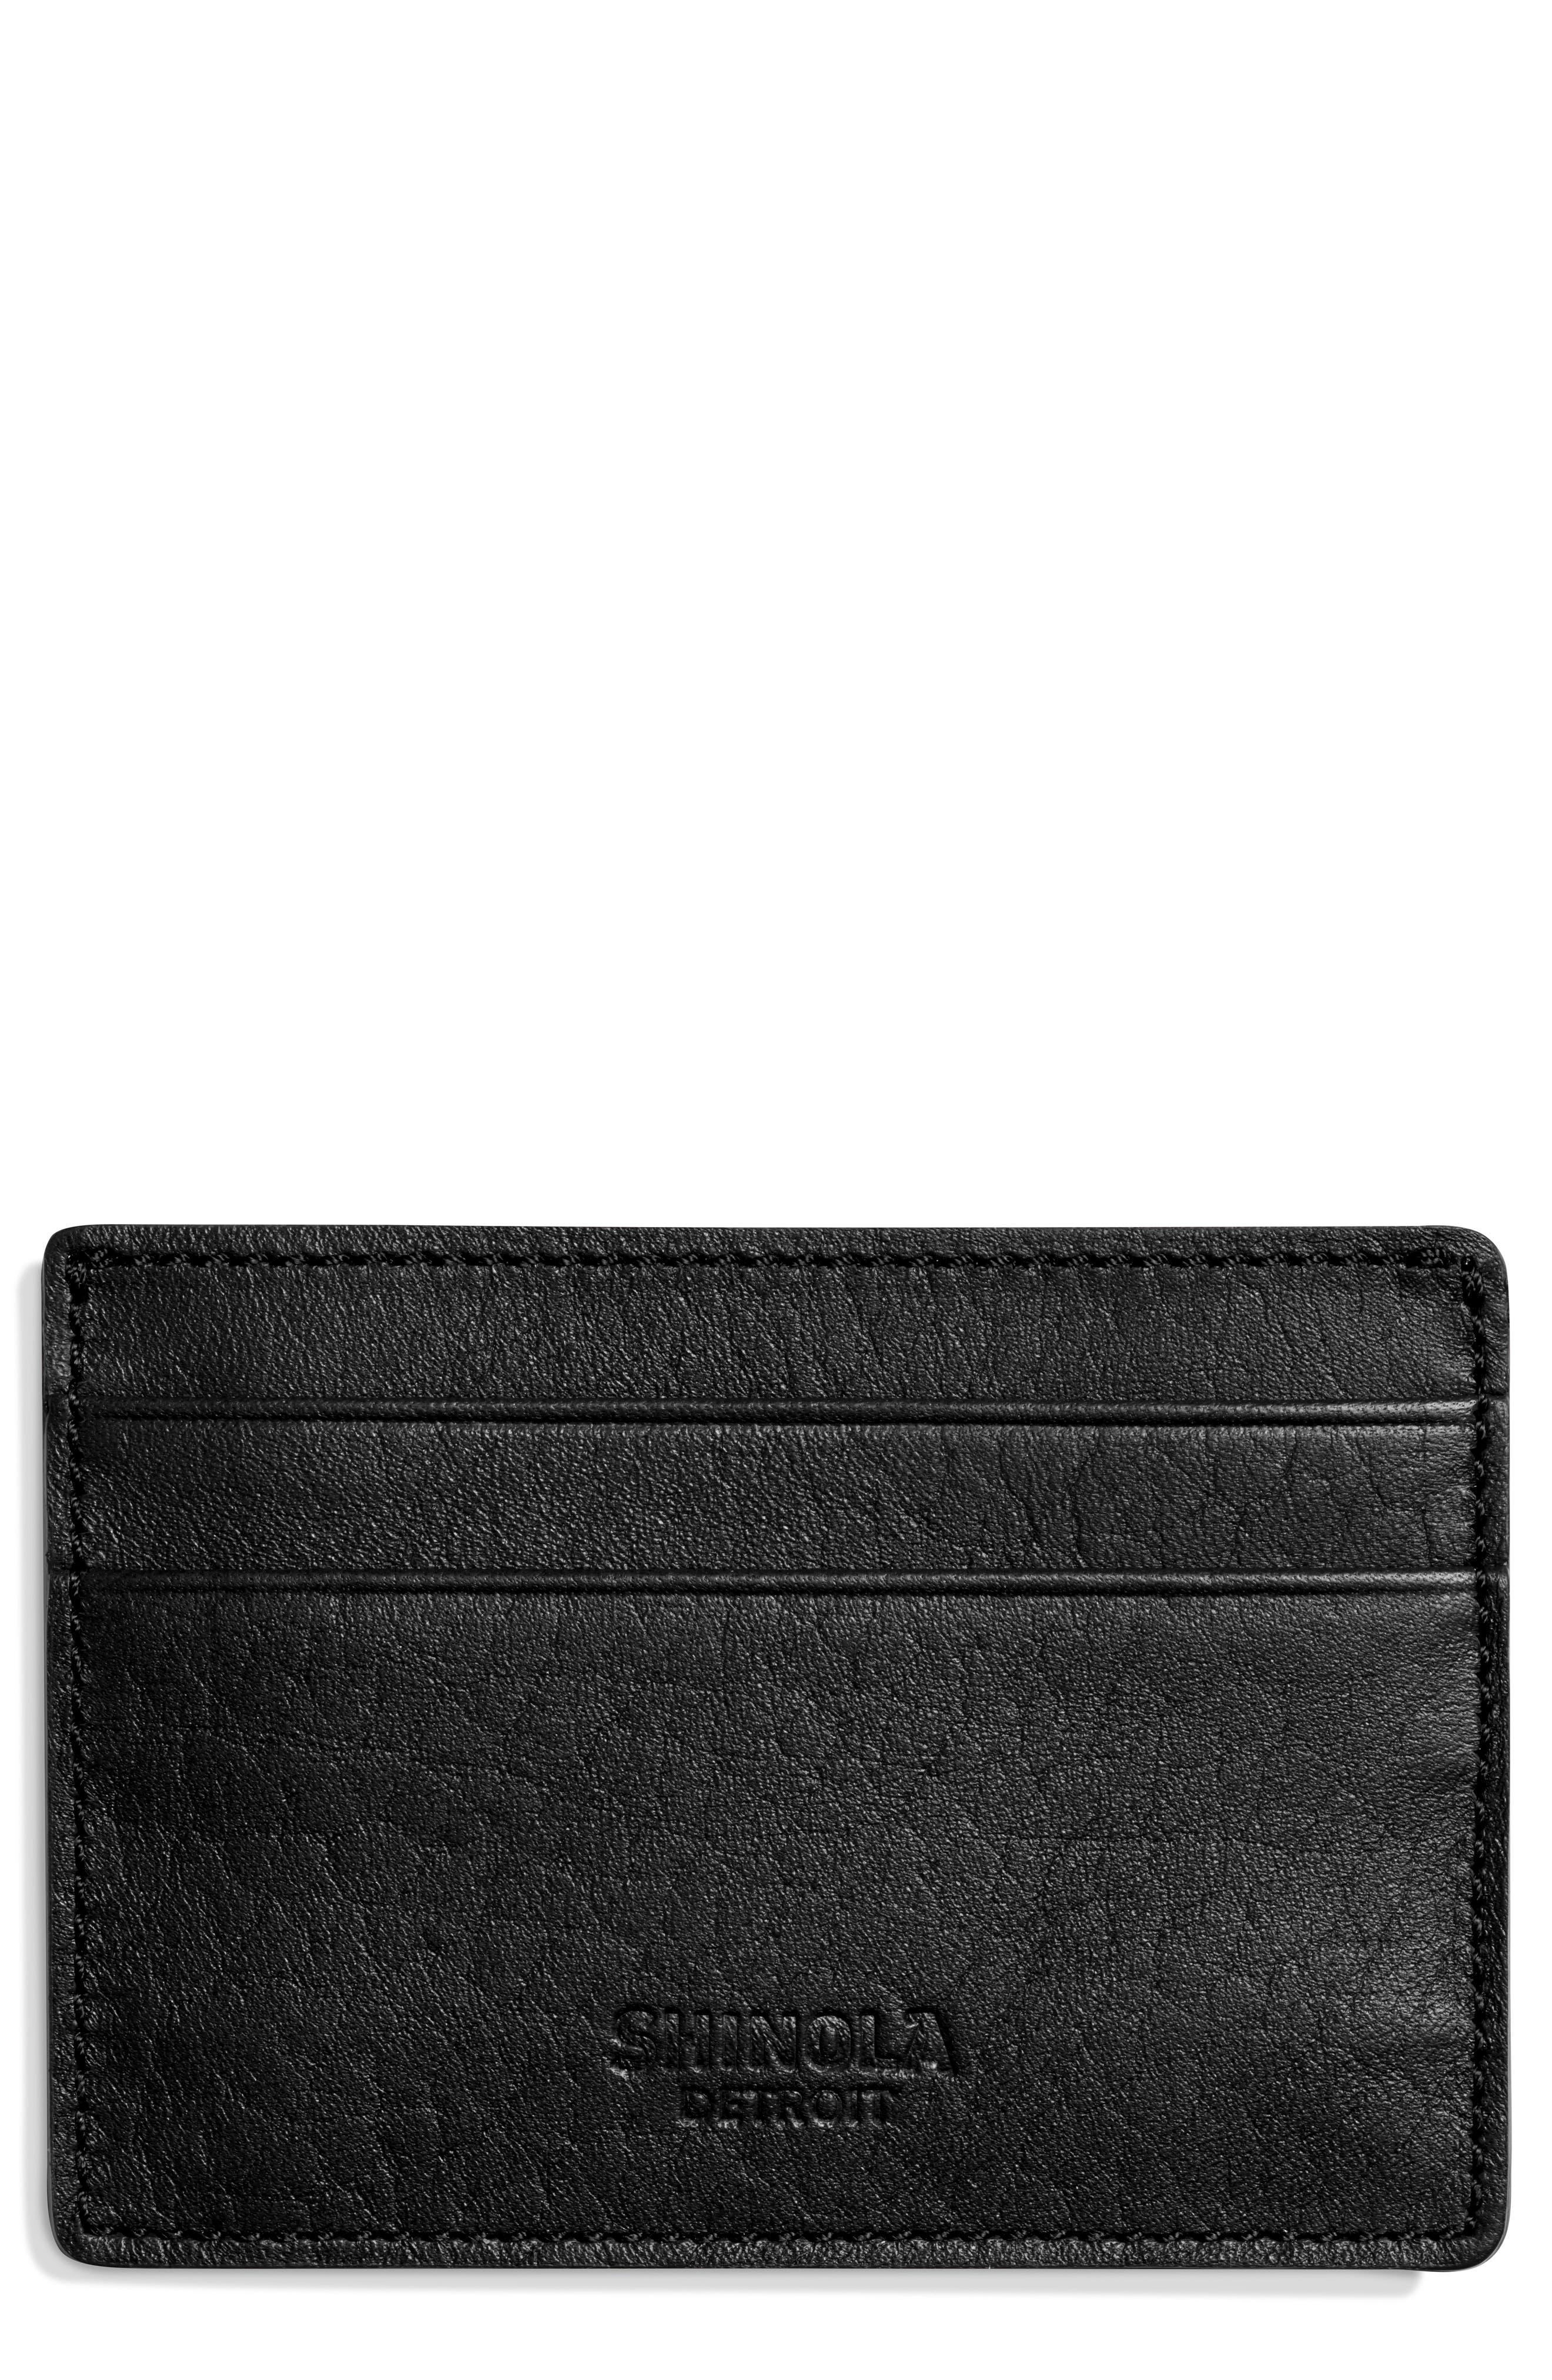 Leather Card Case,                             Main thumbnail 1, color,                             BLACK